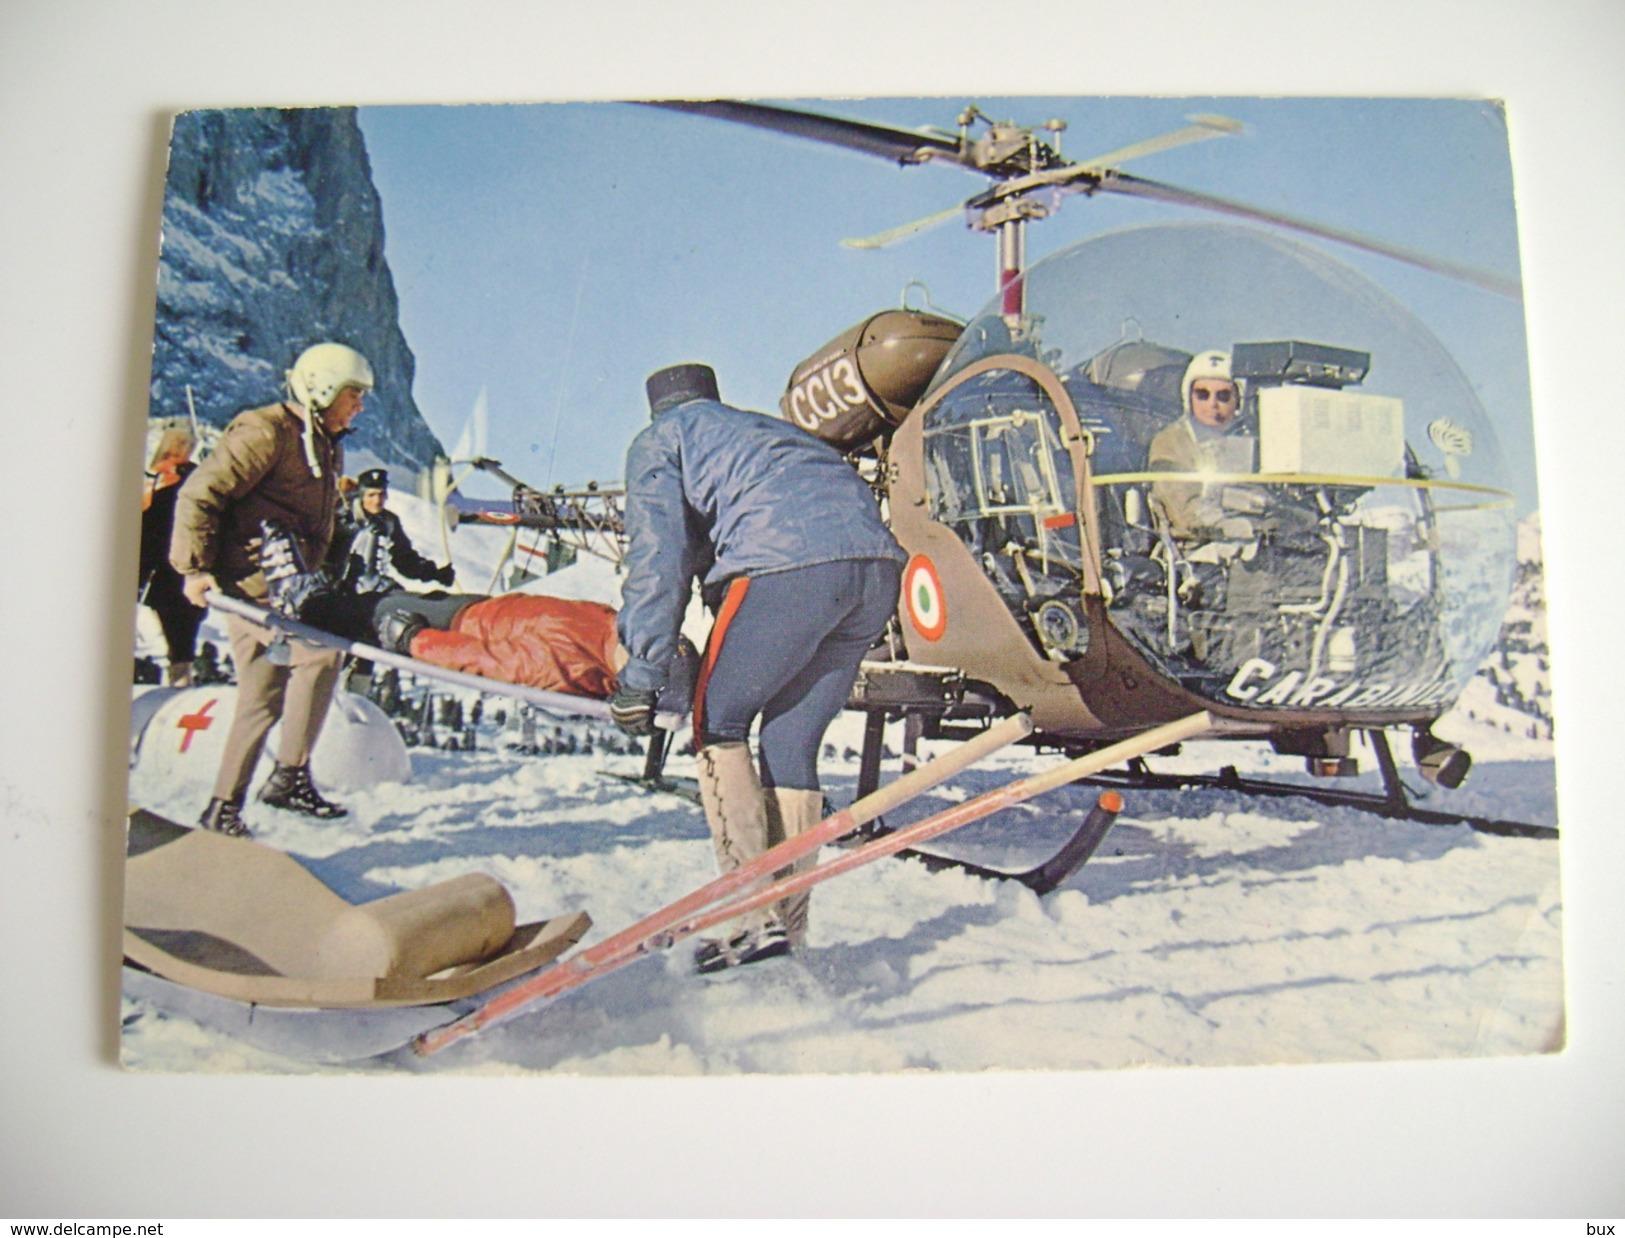 ELICOTTERO     HELYCOPTERE  HELICOPTER   ARMA DEI CARABINIERI  MILITARE CARABINIERE - Elicotteri